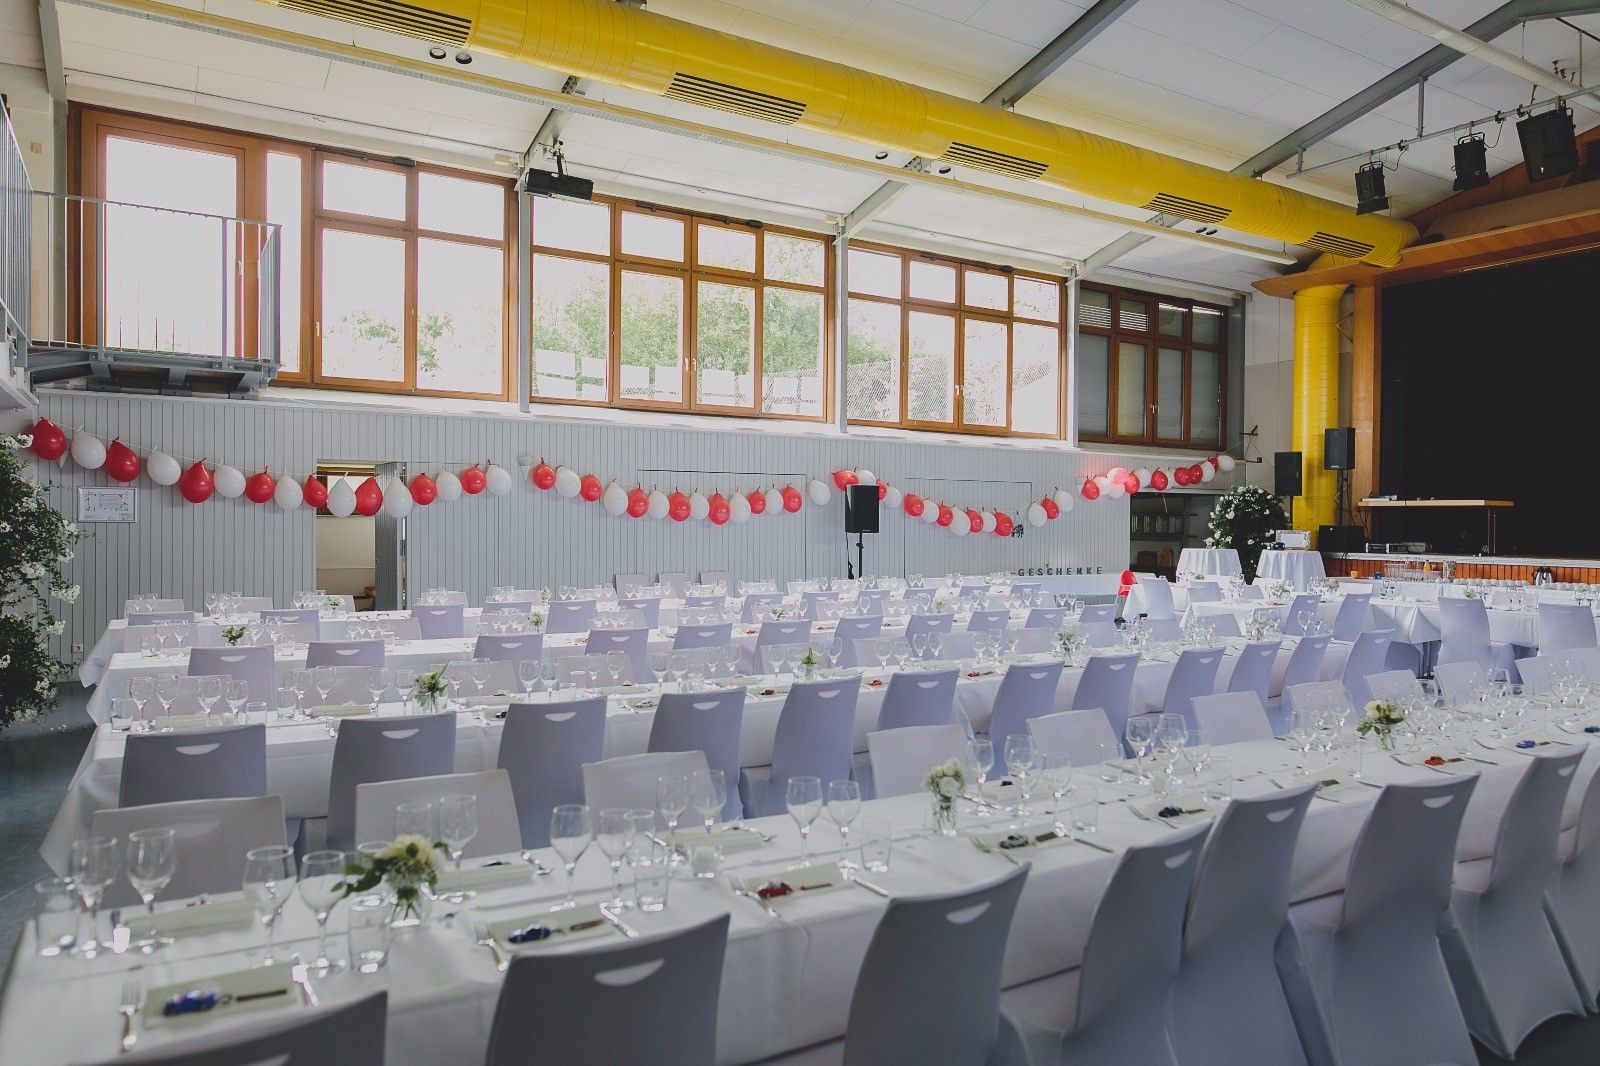 Stuhlhussen Selber Machen Hochzeit stuhlhussen mieten - djdanny.de